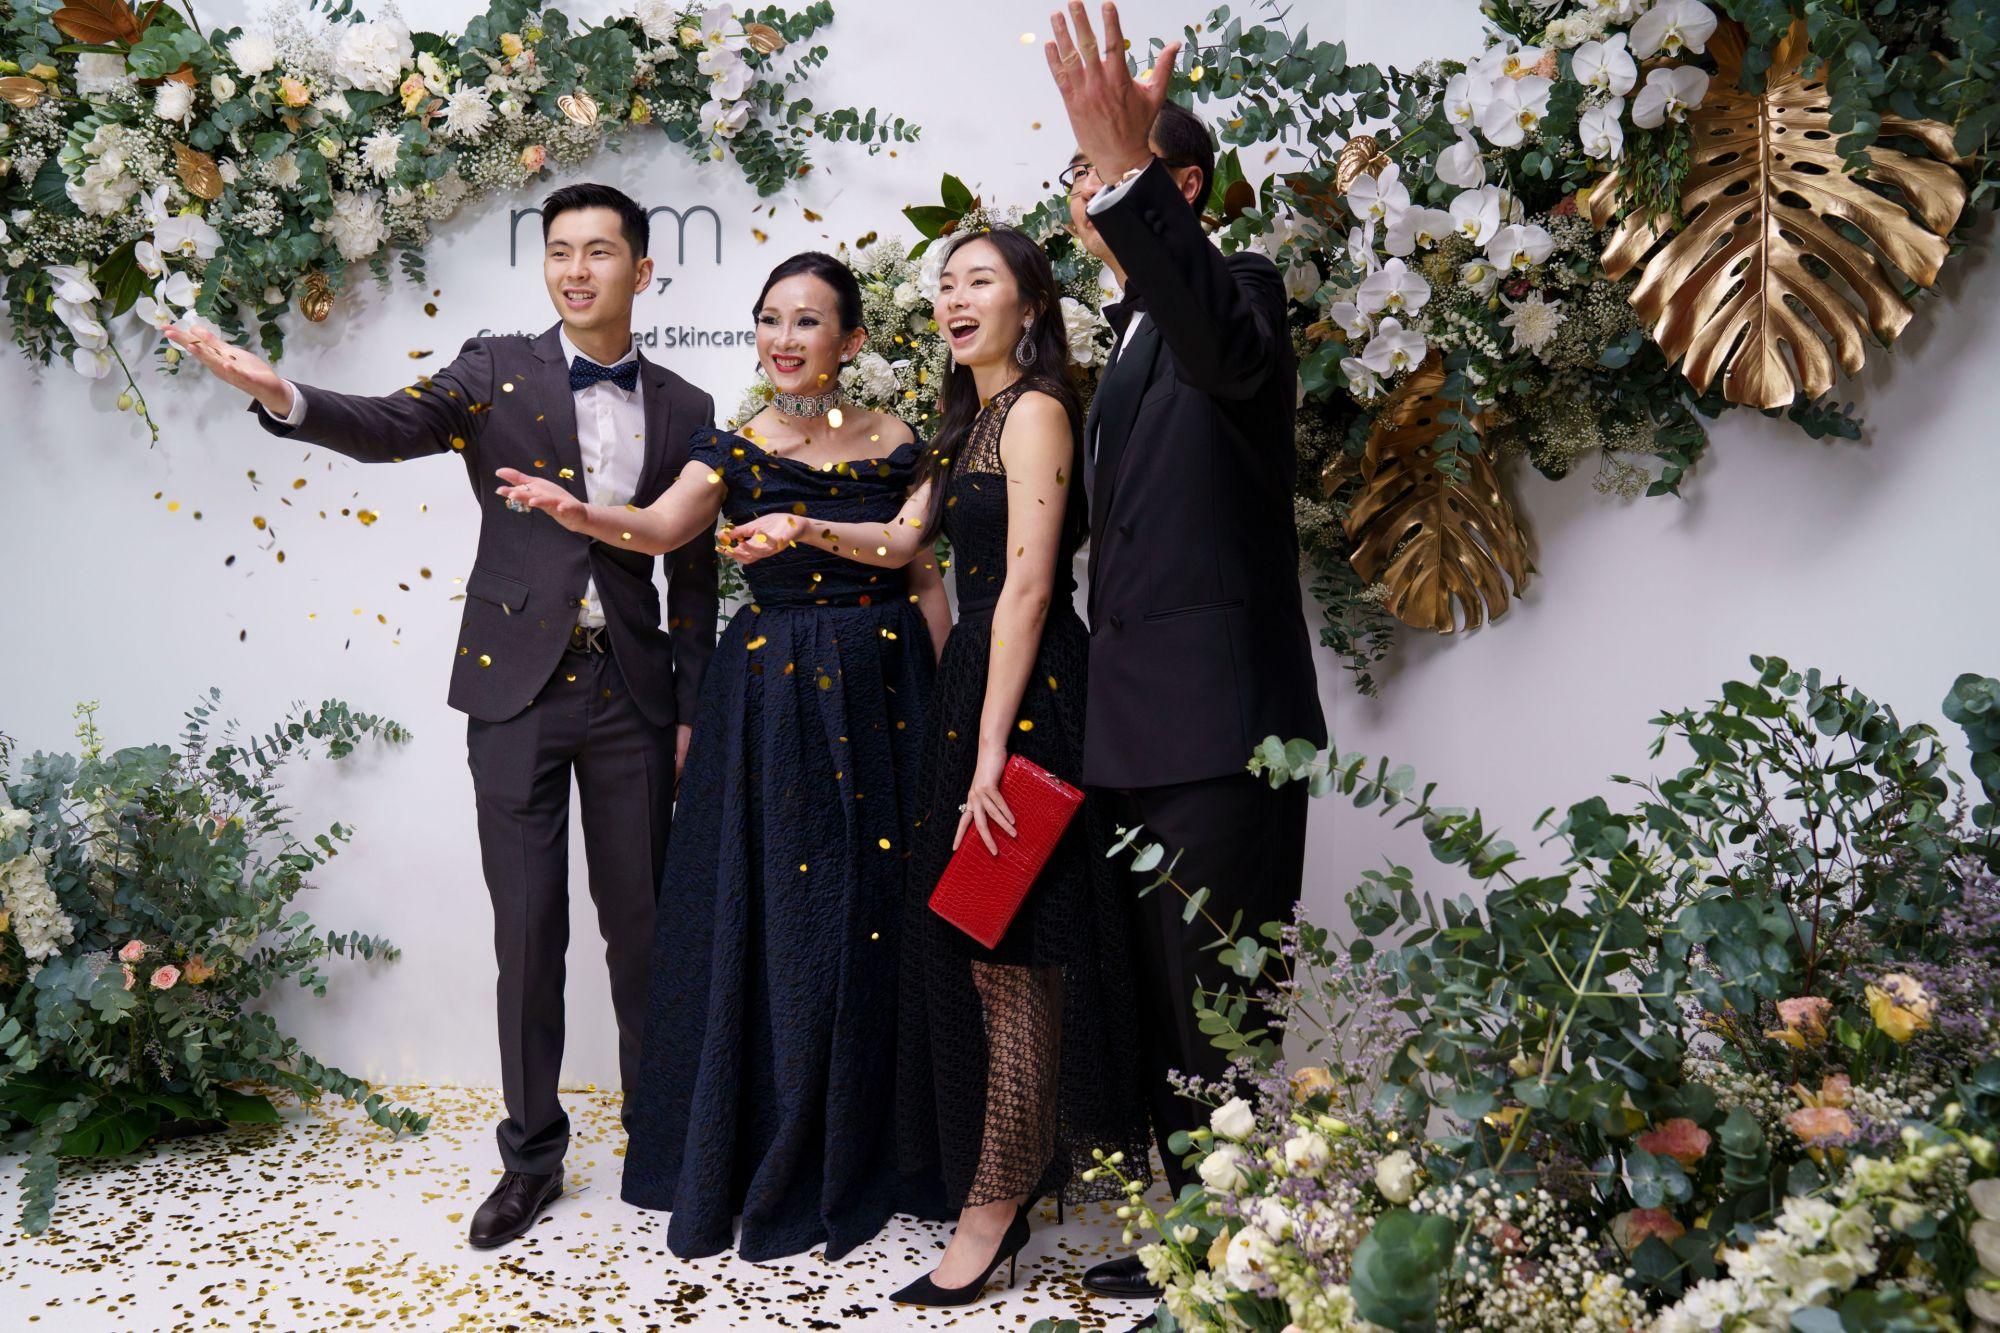 Nicholas Heah, Caroline Low-Heah, Elizabeth Heah, Heah Sieu Min